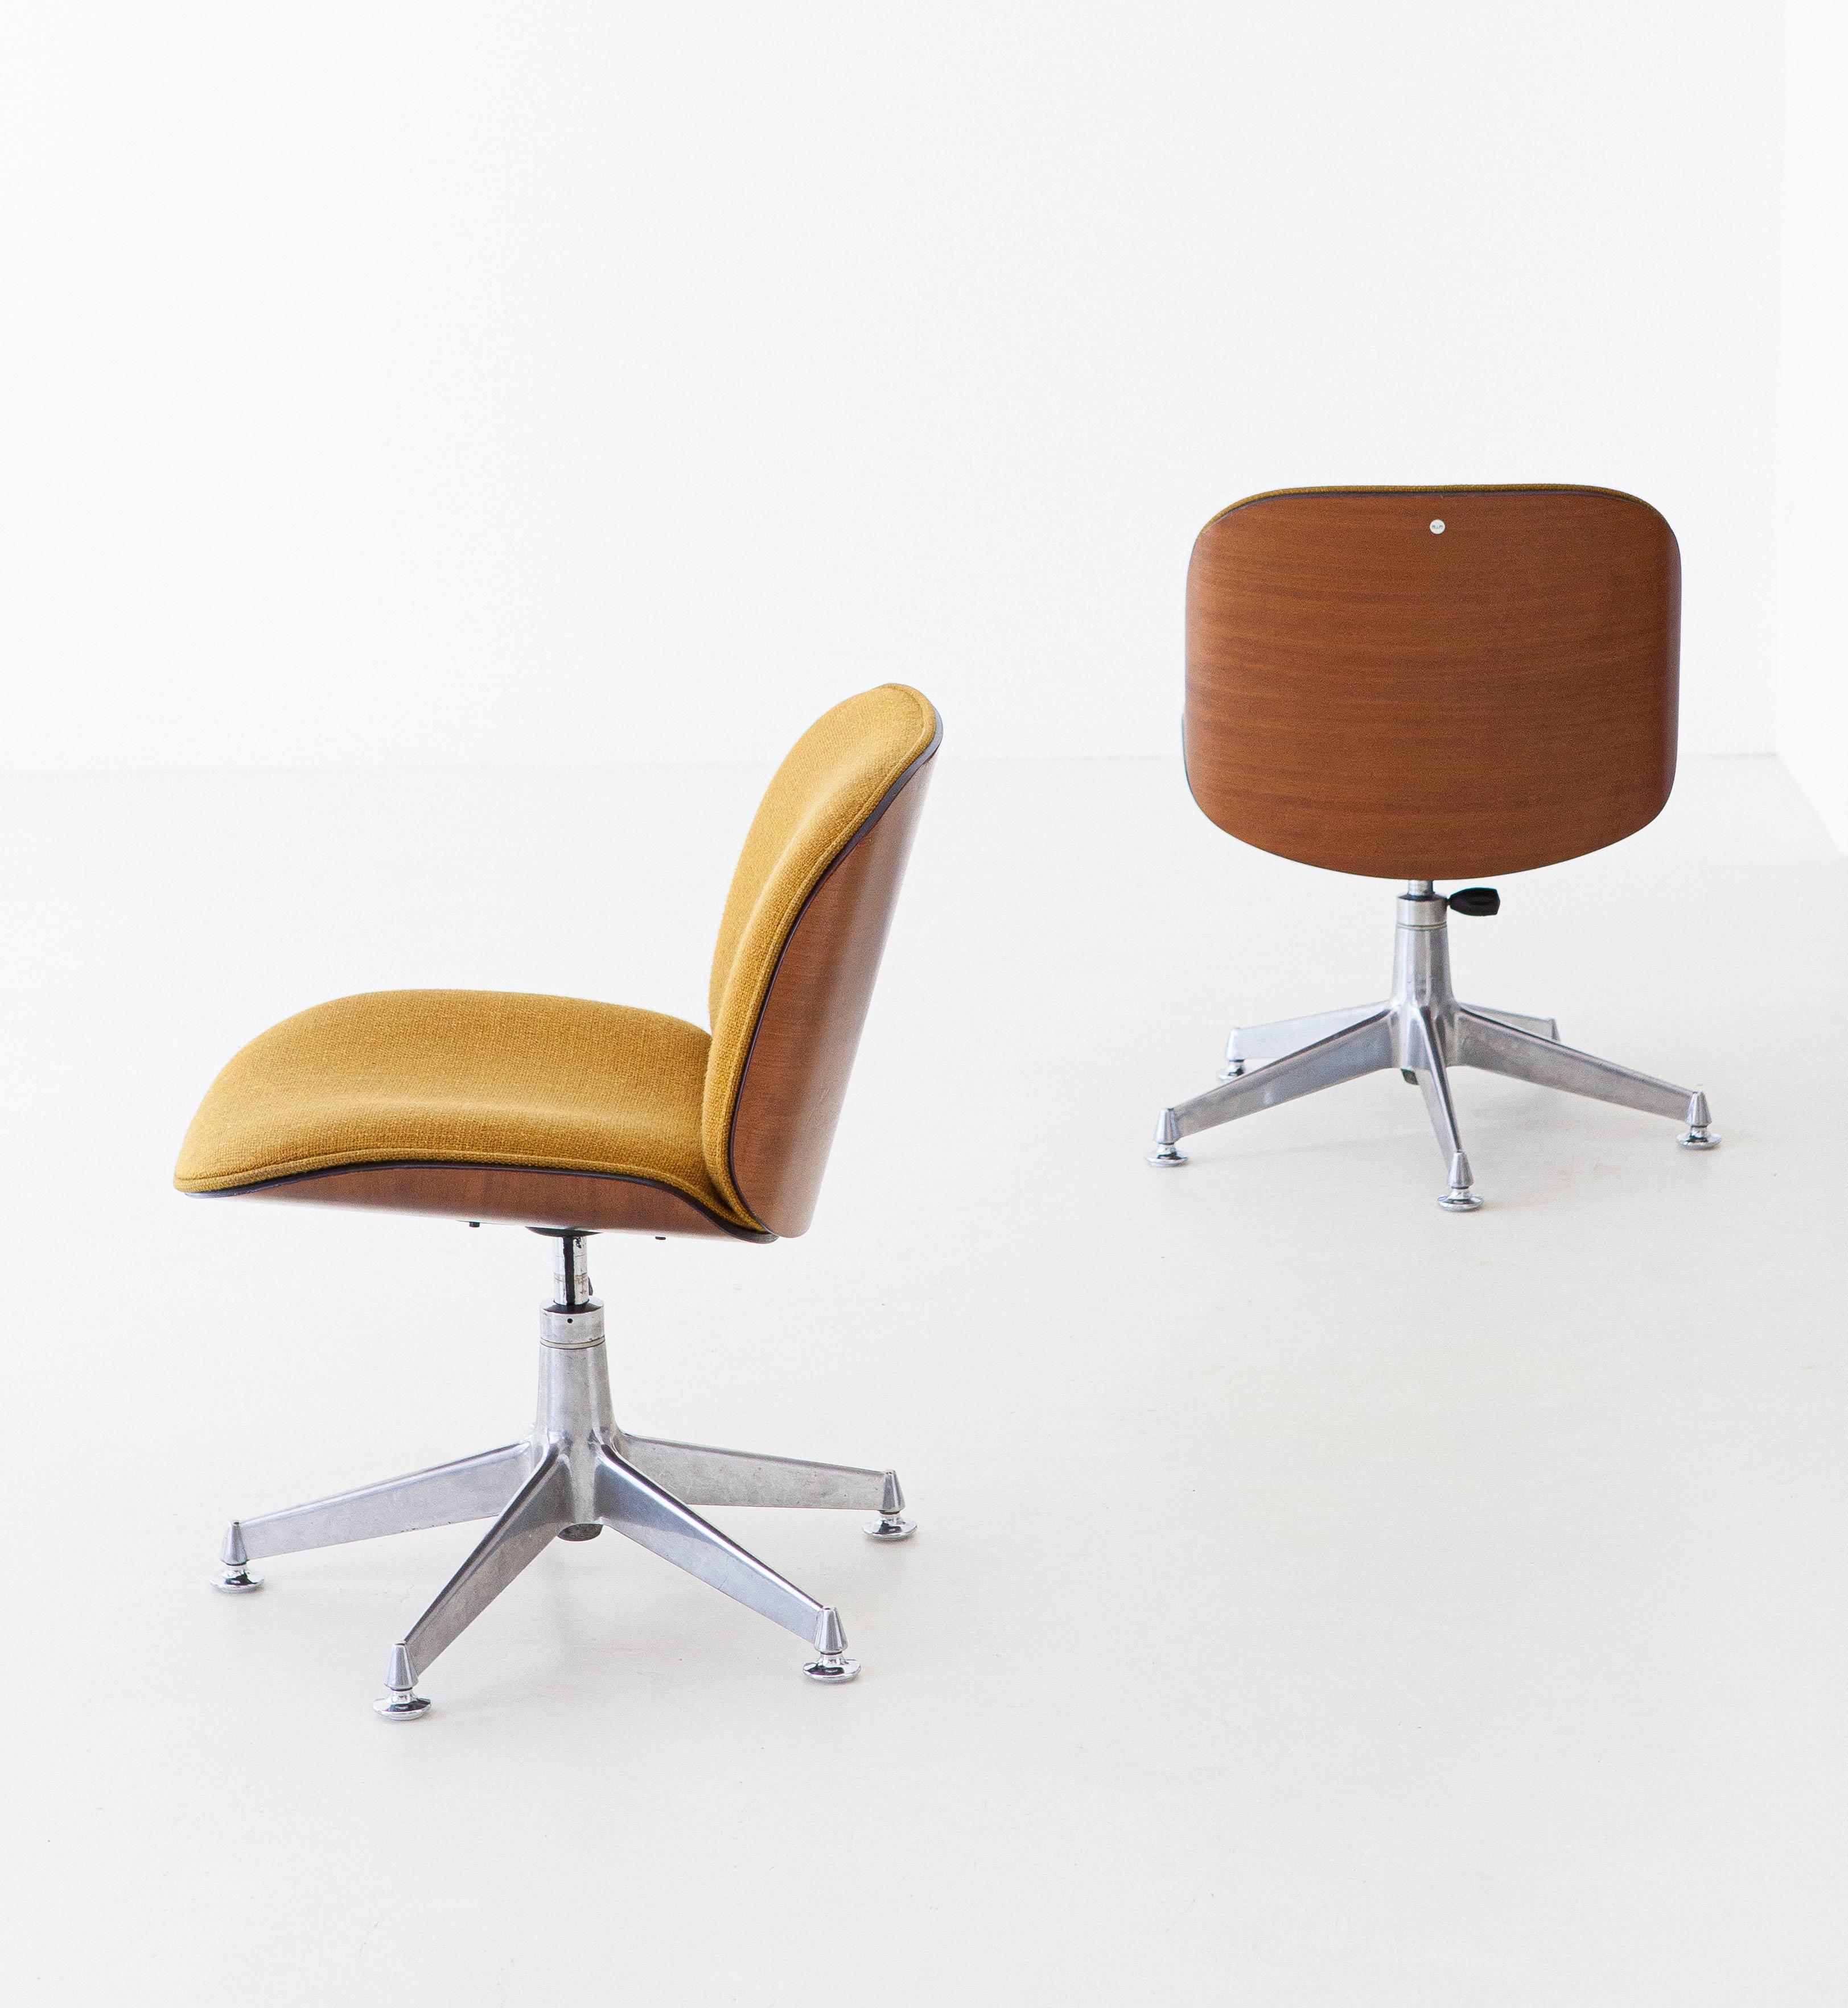 1950s-ico-parisi-for-mim-walnut-swivel-desk-chairs-3-se305